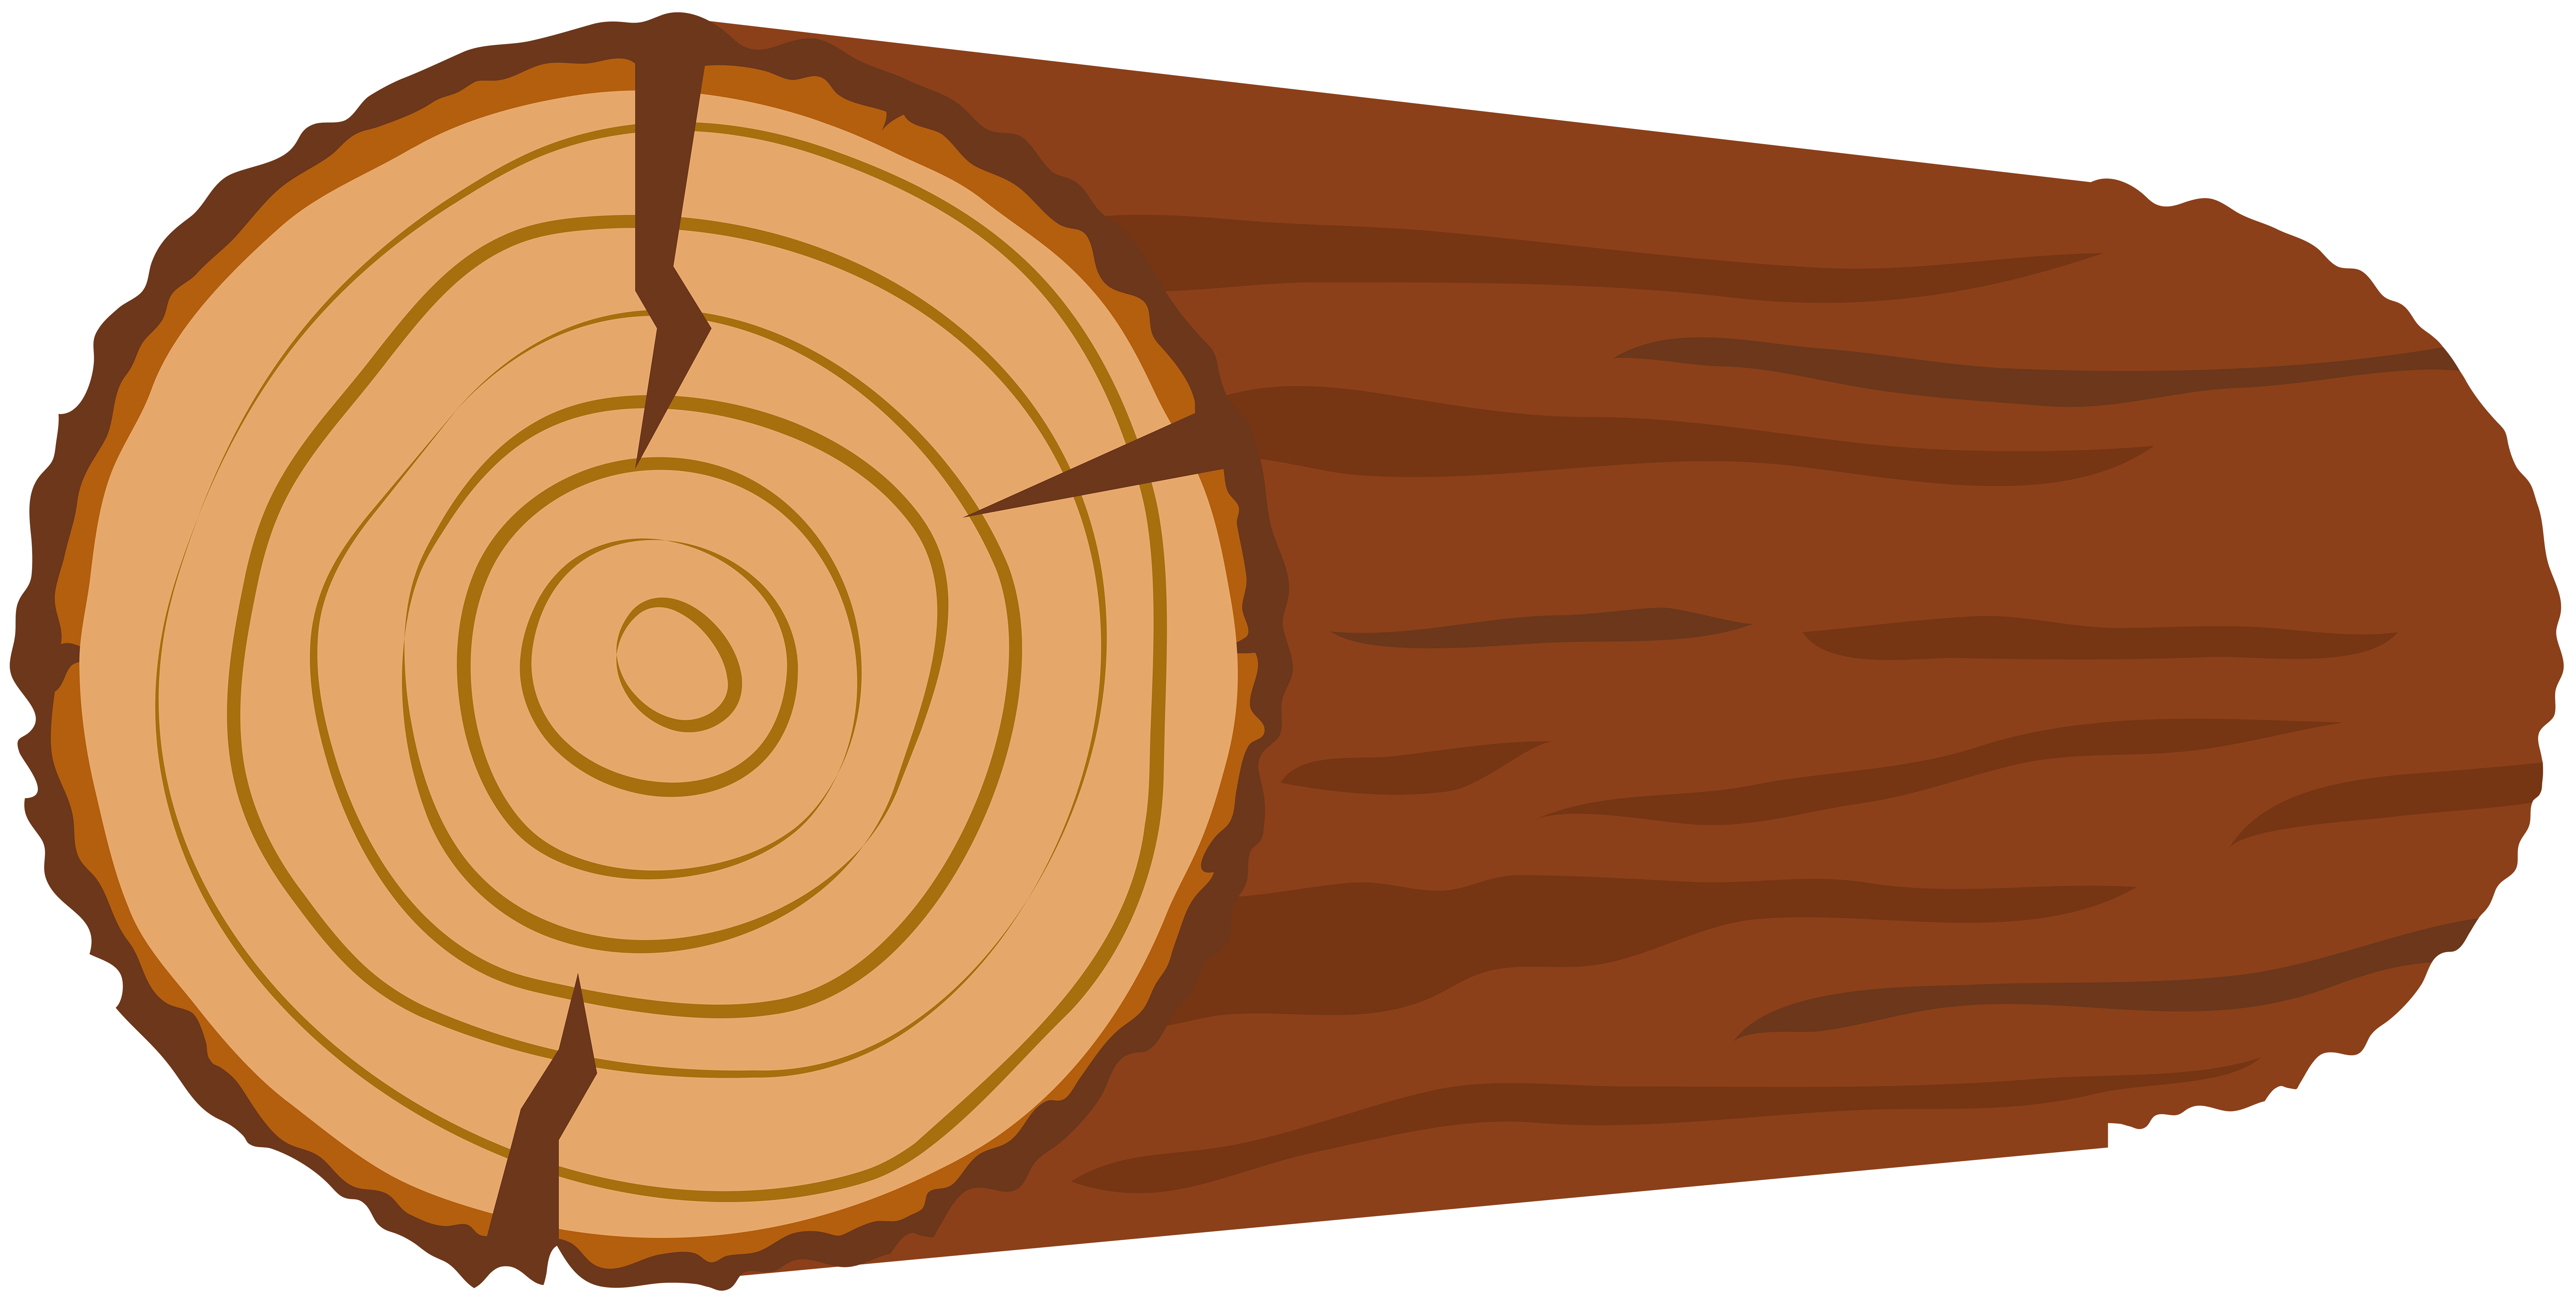 Log Transparent Clip Art Image.